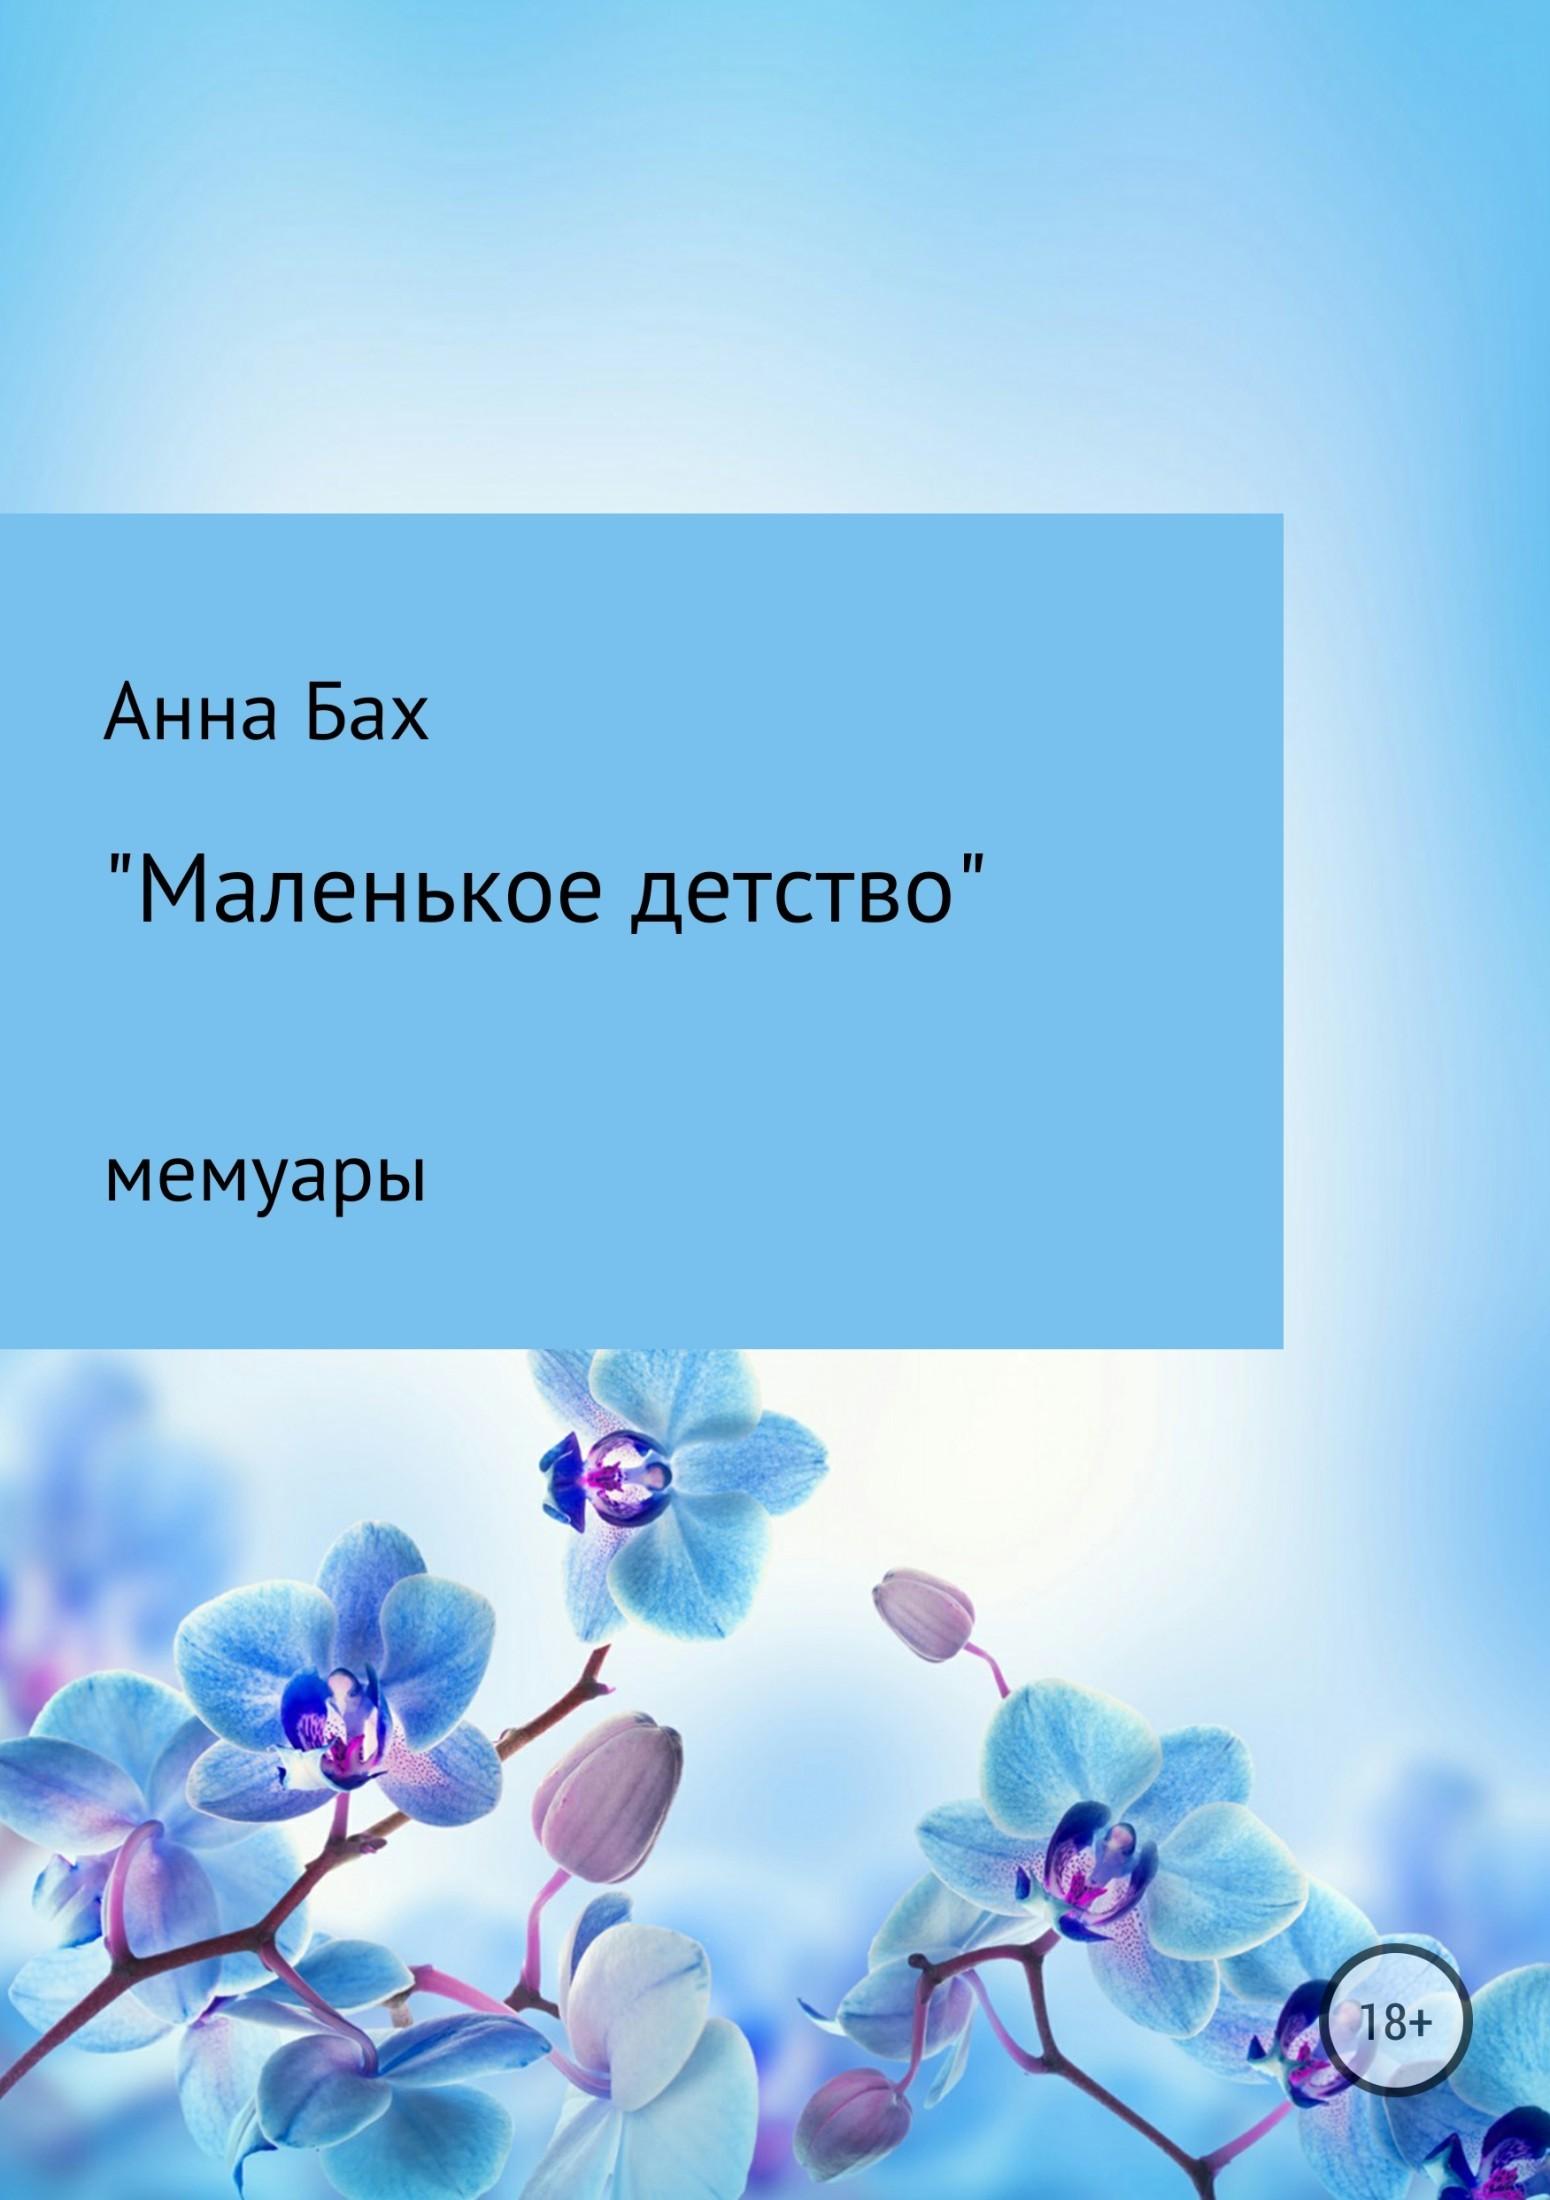 Анна Борисовна Бах Маленькое детство детство лидера